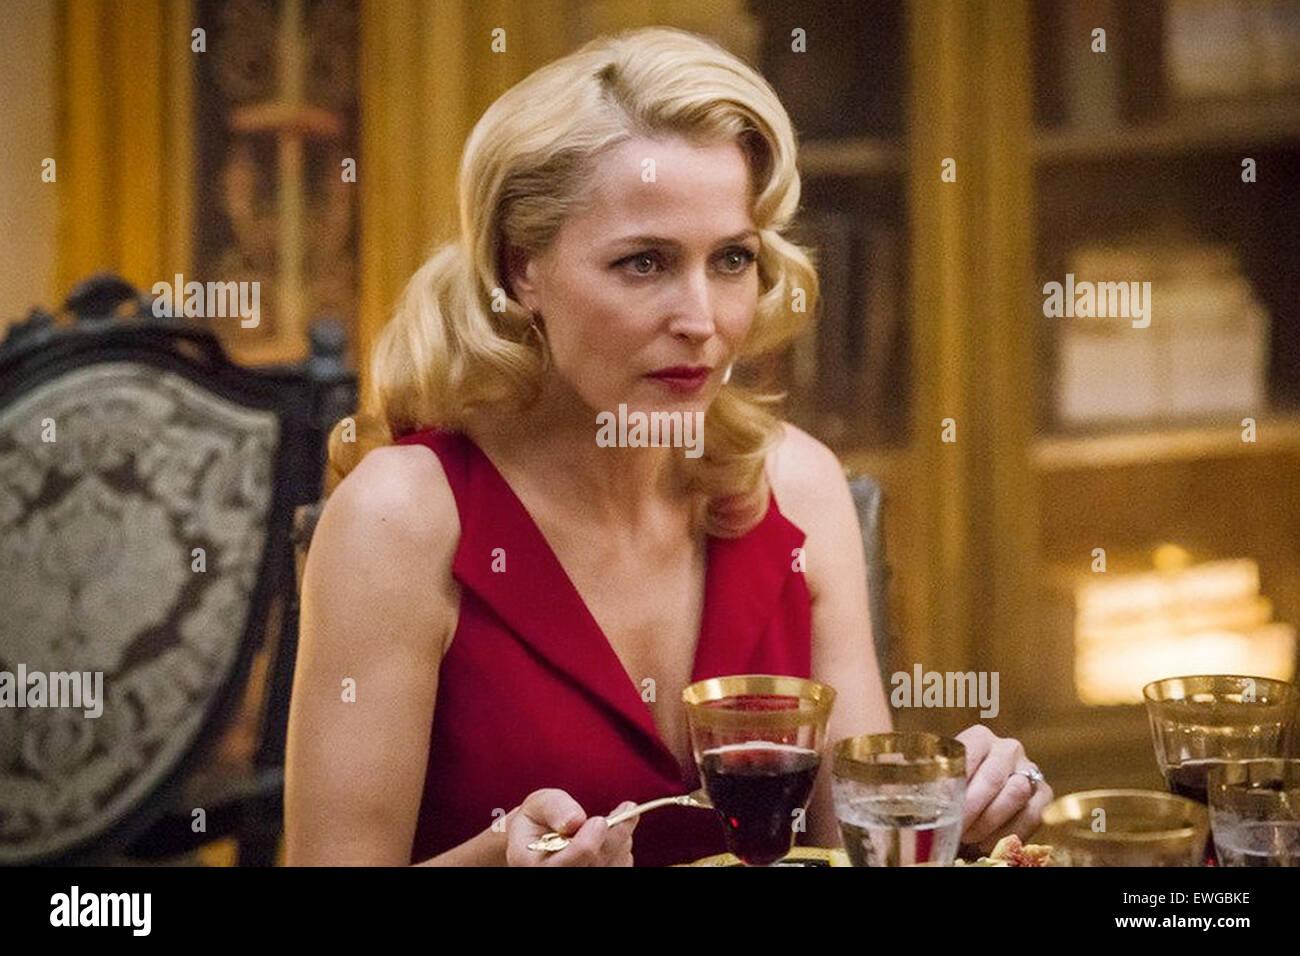 HANNIBAL NBCUniversal Fernsehreihe mit Gillian Anderson Stockbild